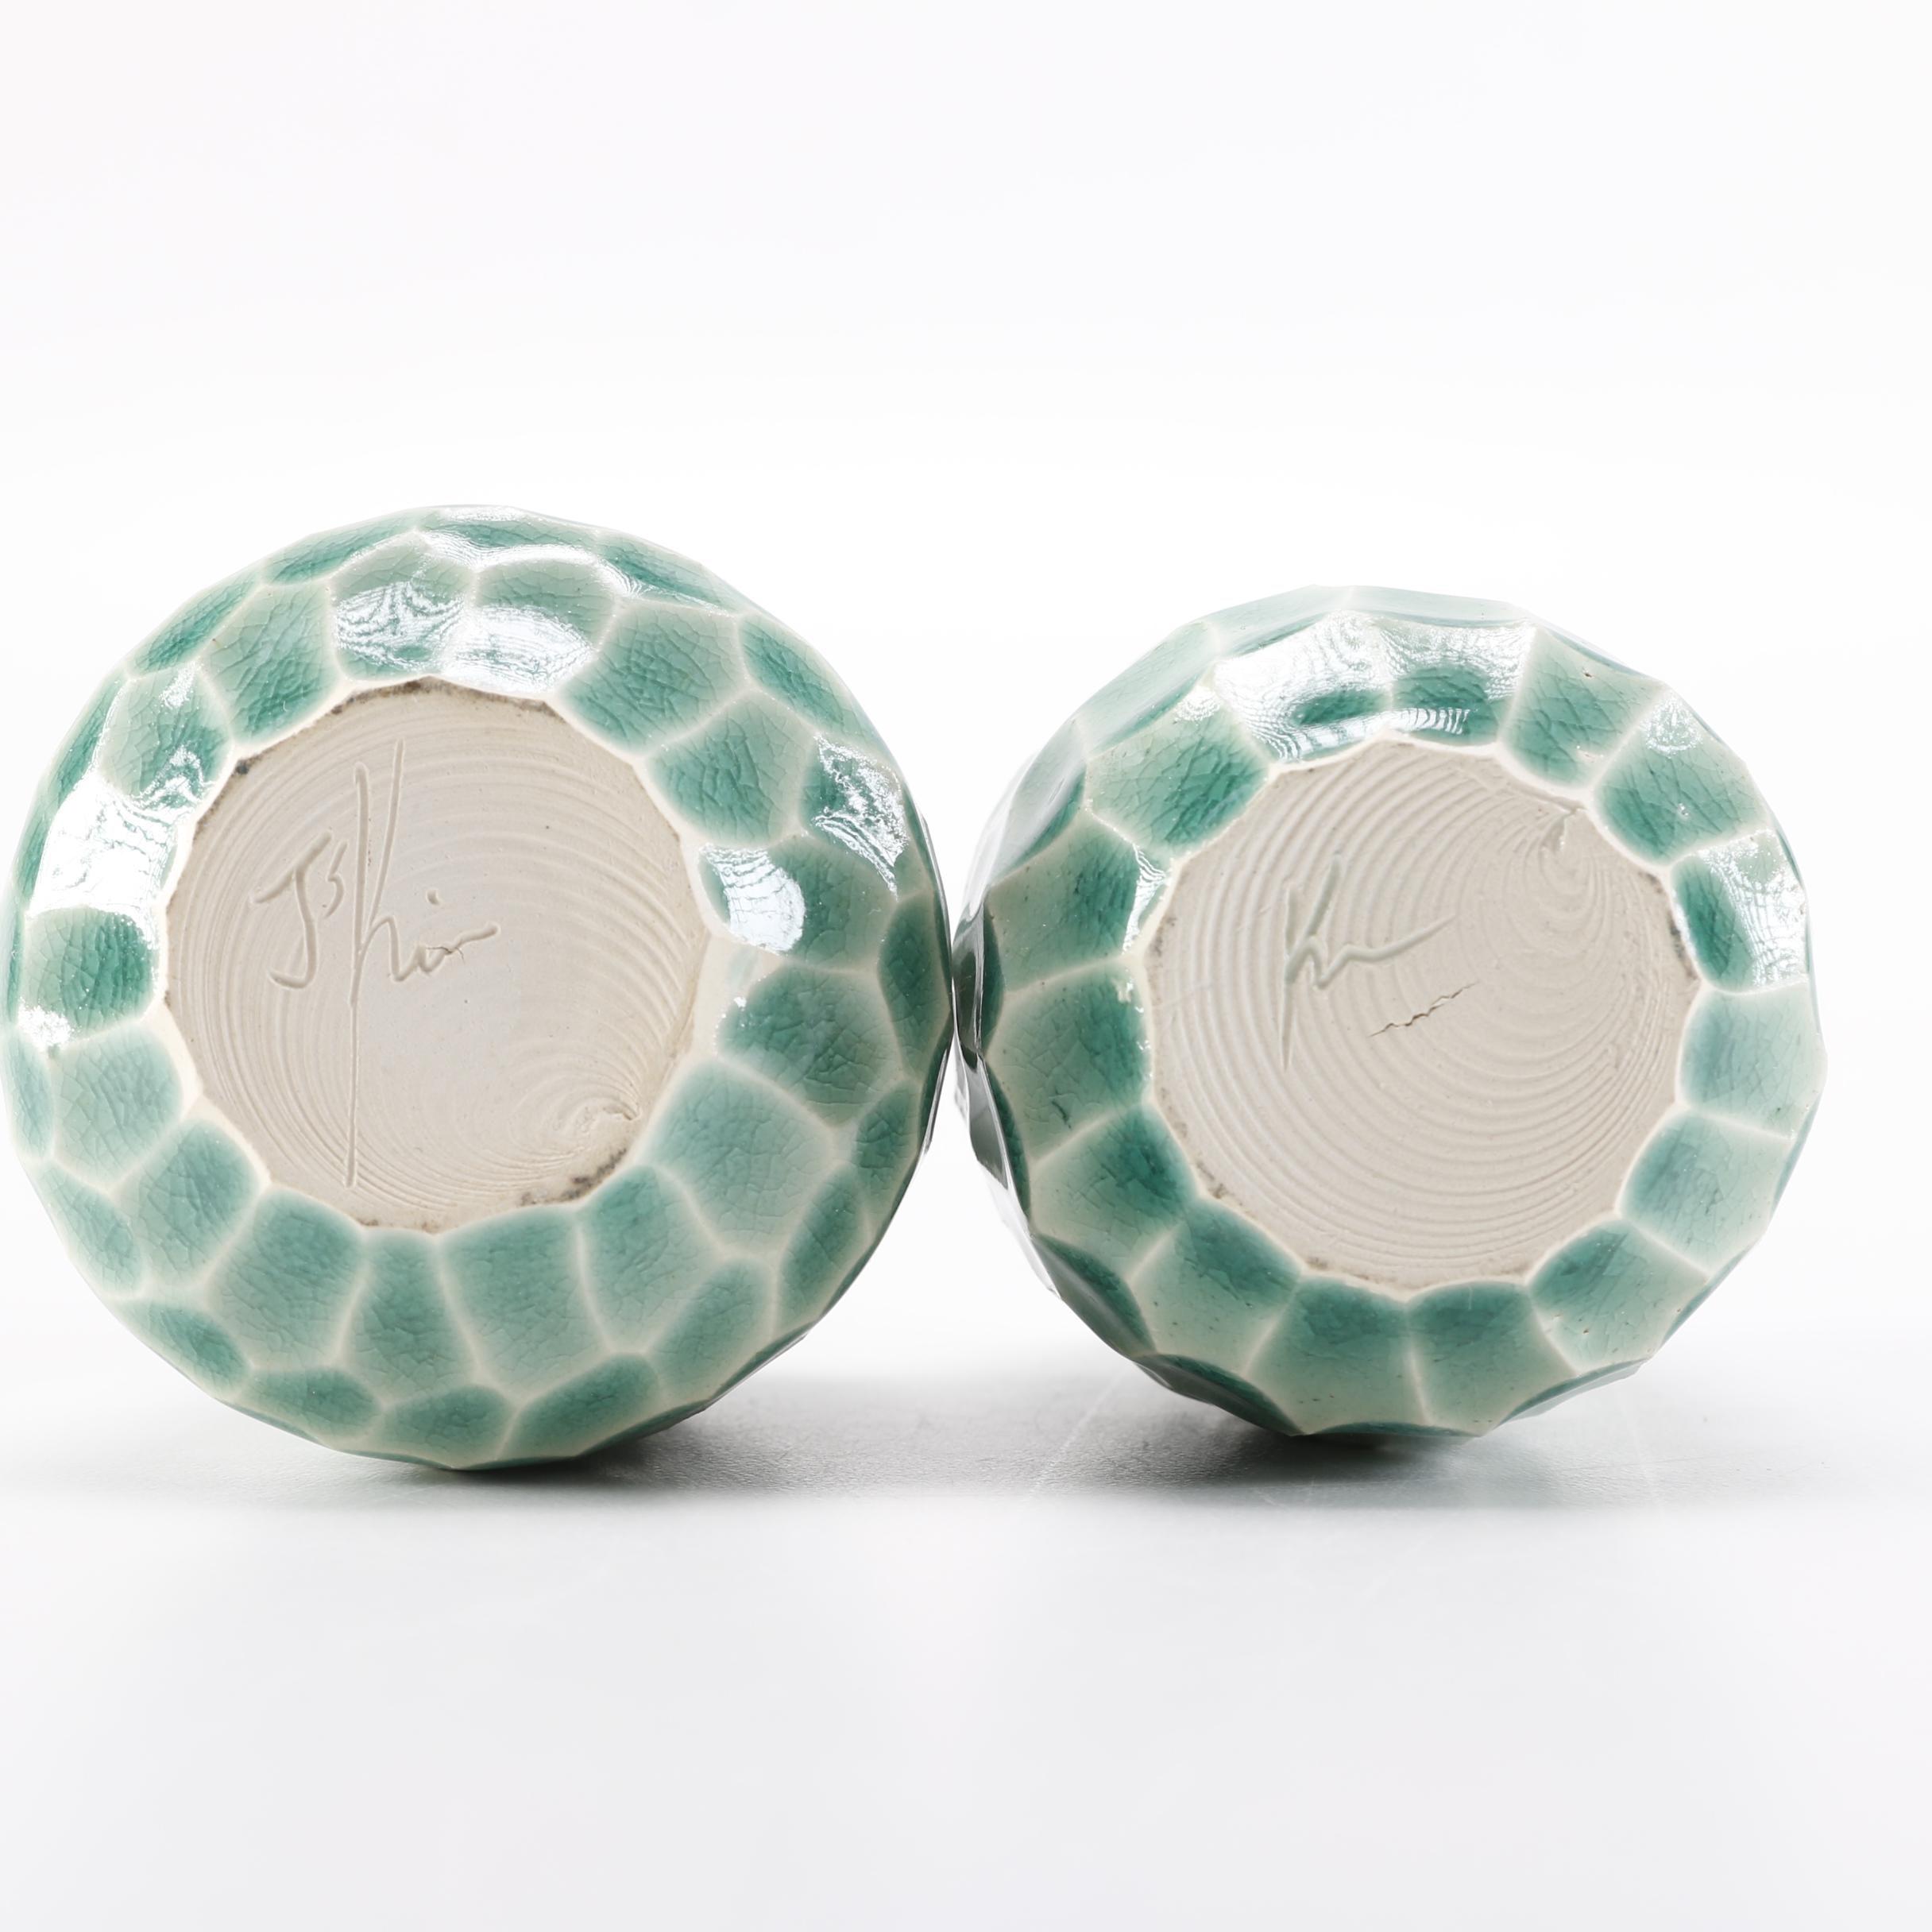 J S Kim Celadon Glazed Pottery Ebth